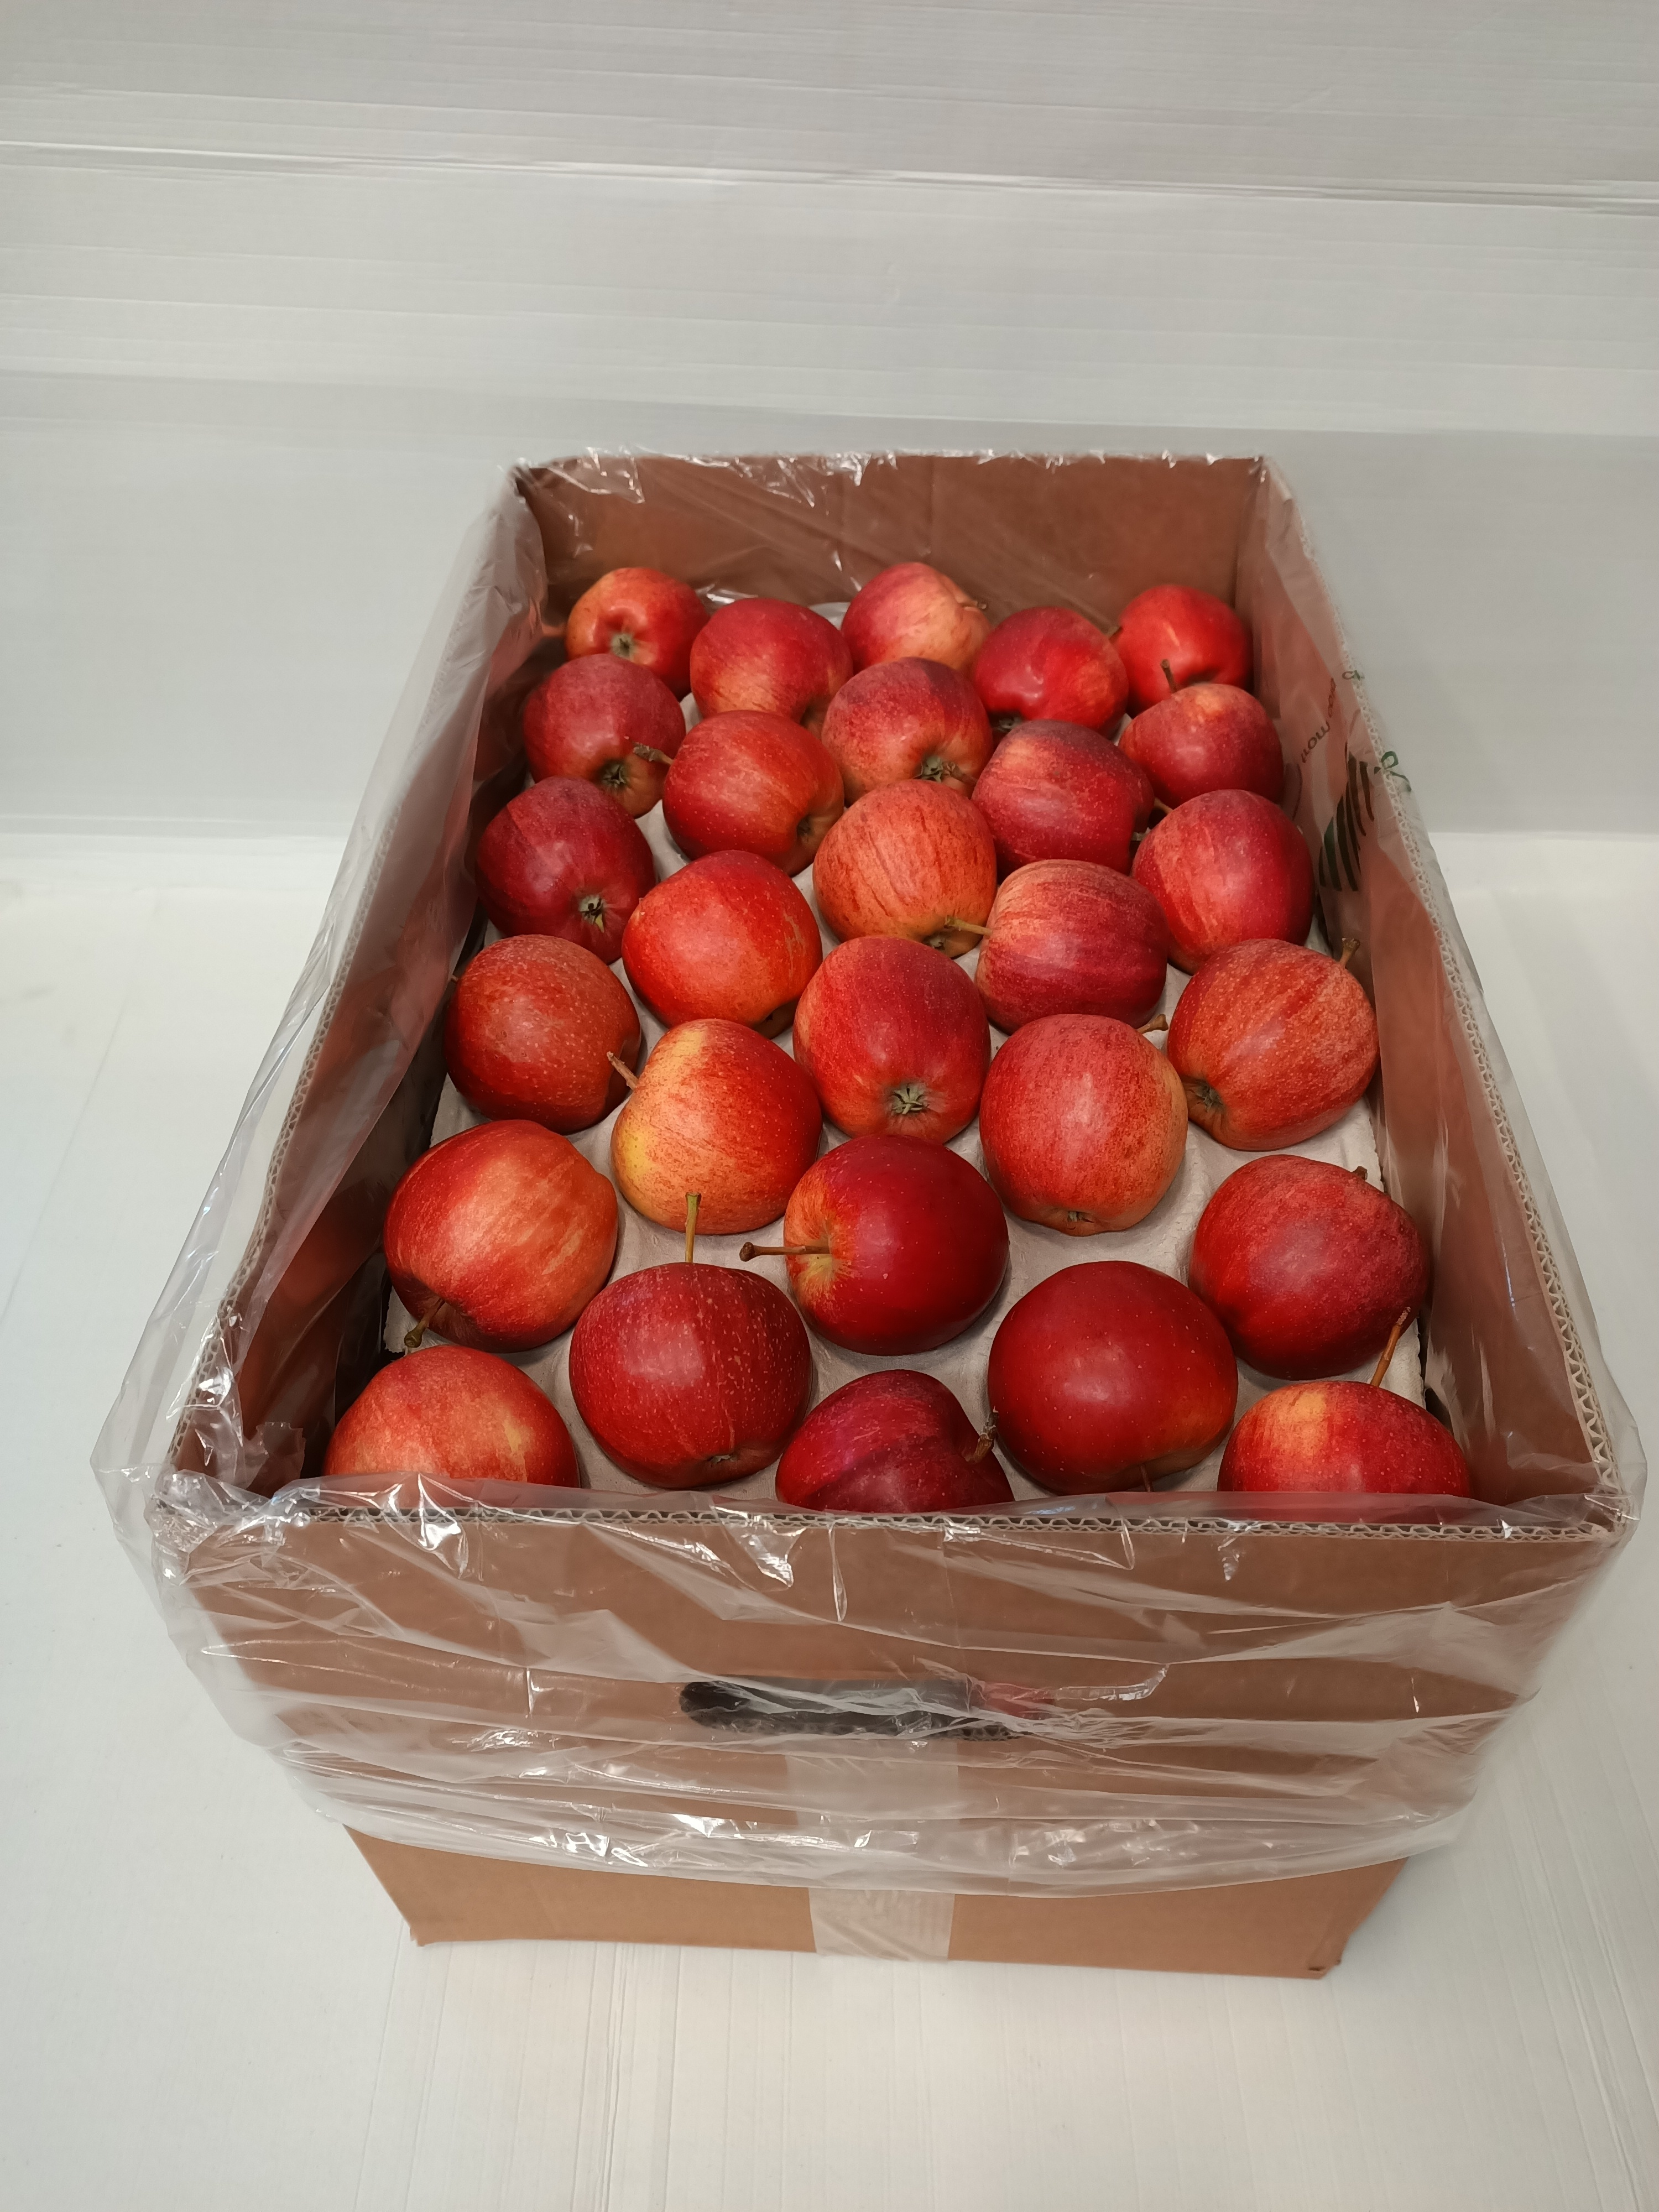 Fresh apple royal gala Chile